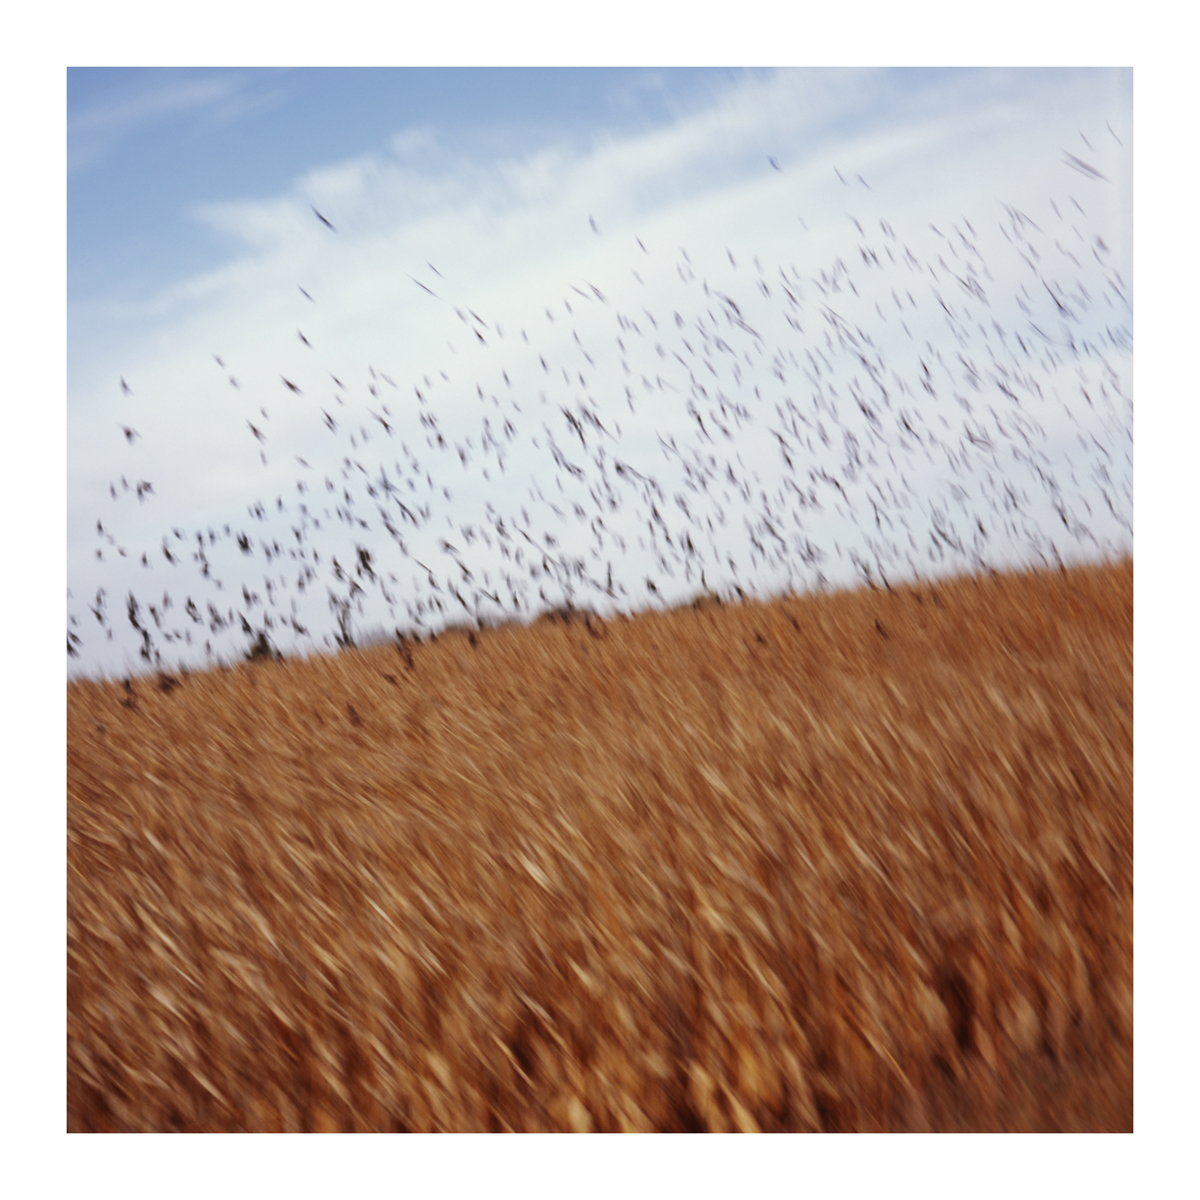 Cornfield and Birds, Iowa, 2014